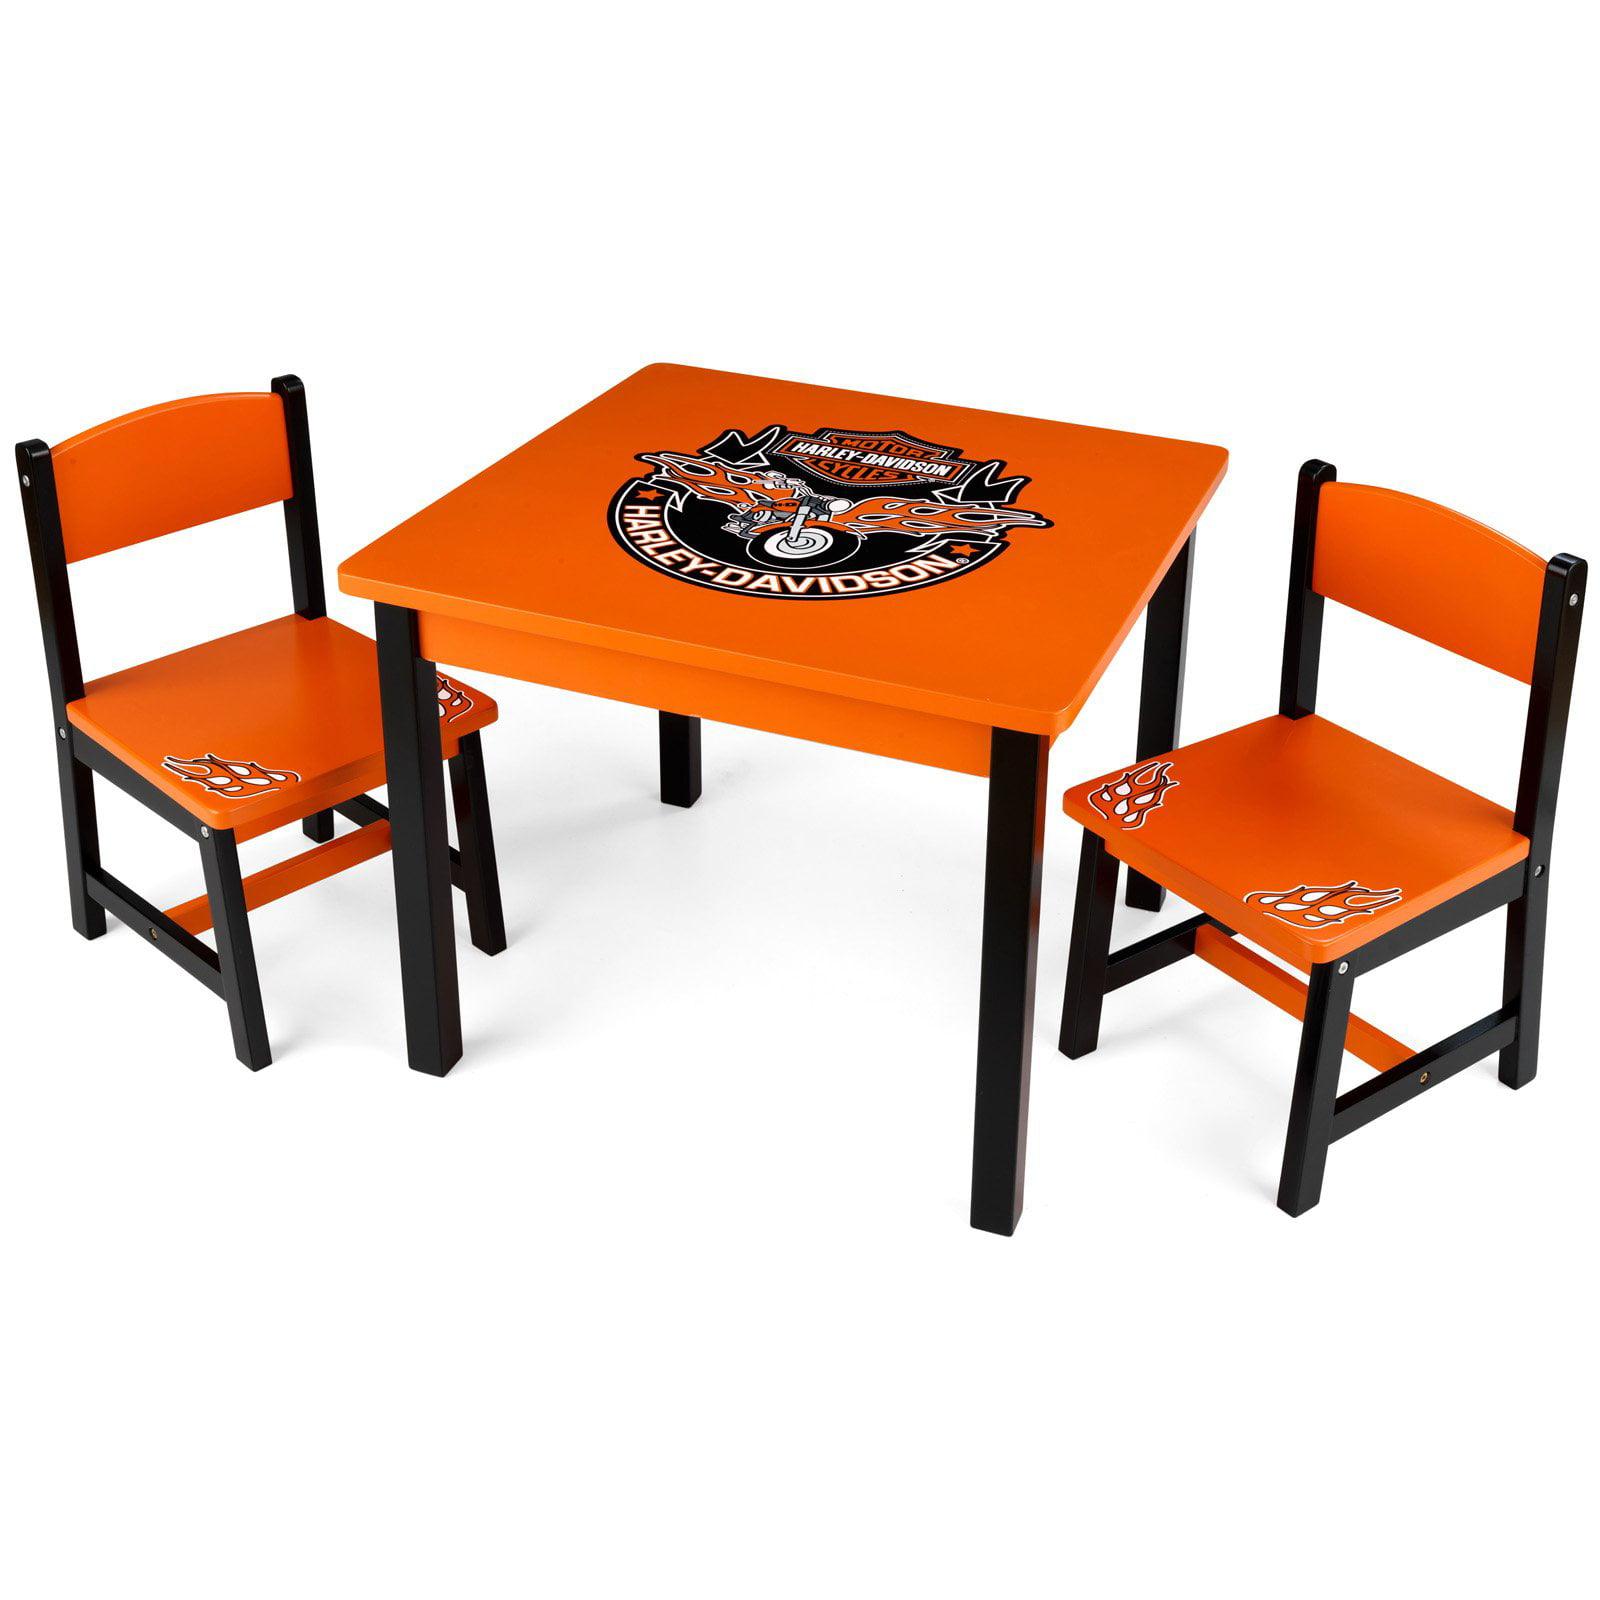 KidKraft Harley-Davidson Table & 2 Chair Set - 10212